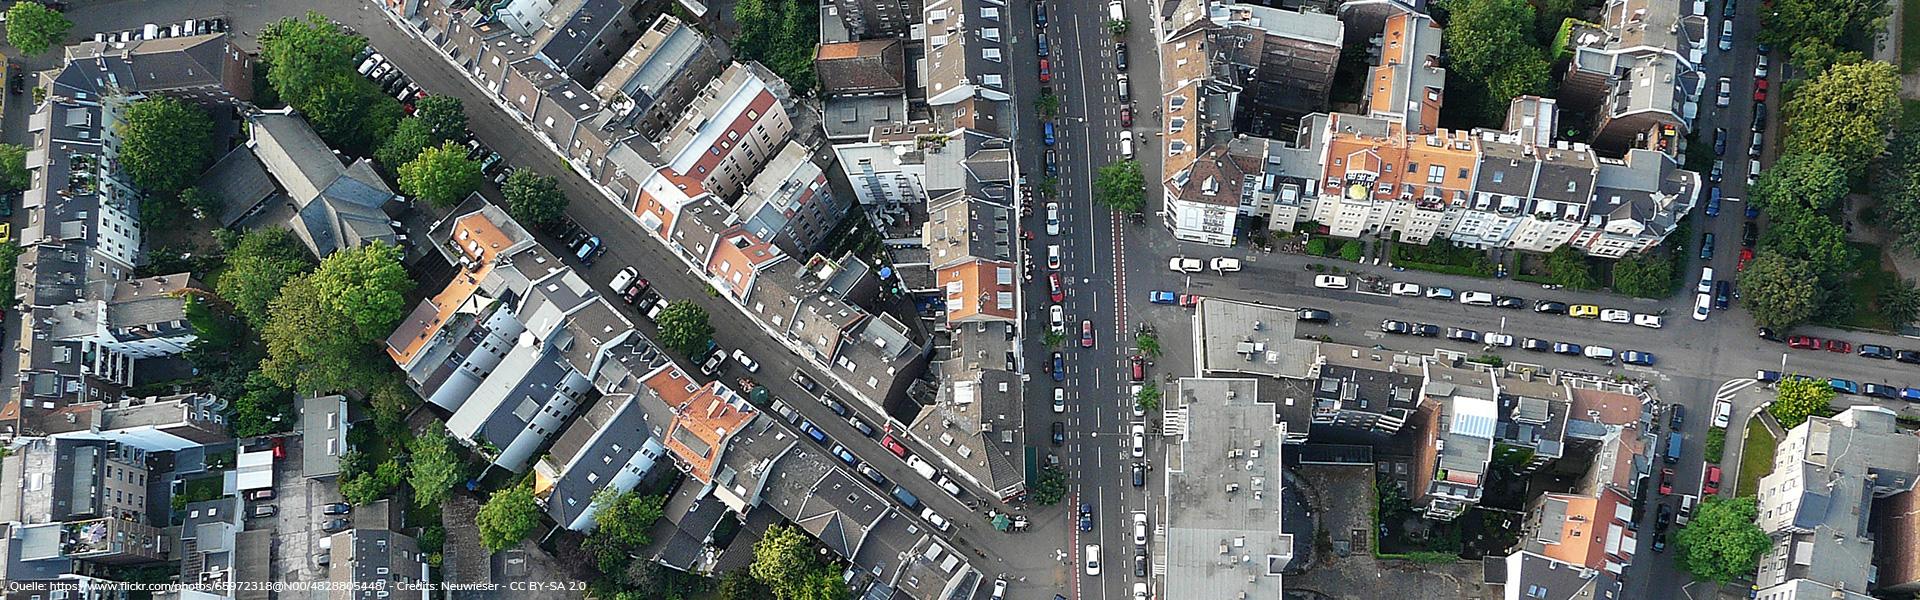 Köln Nippes cologne Kreuzung Neusser Straße Goost Immobilien